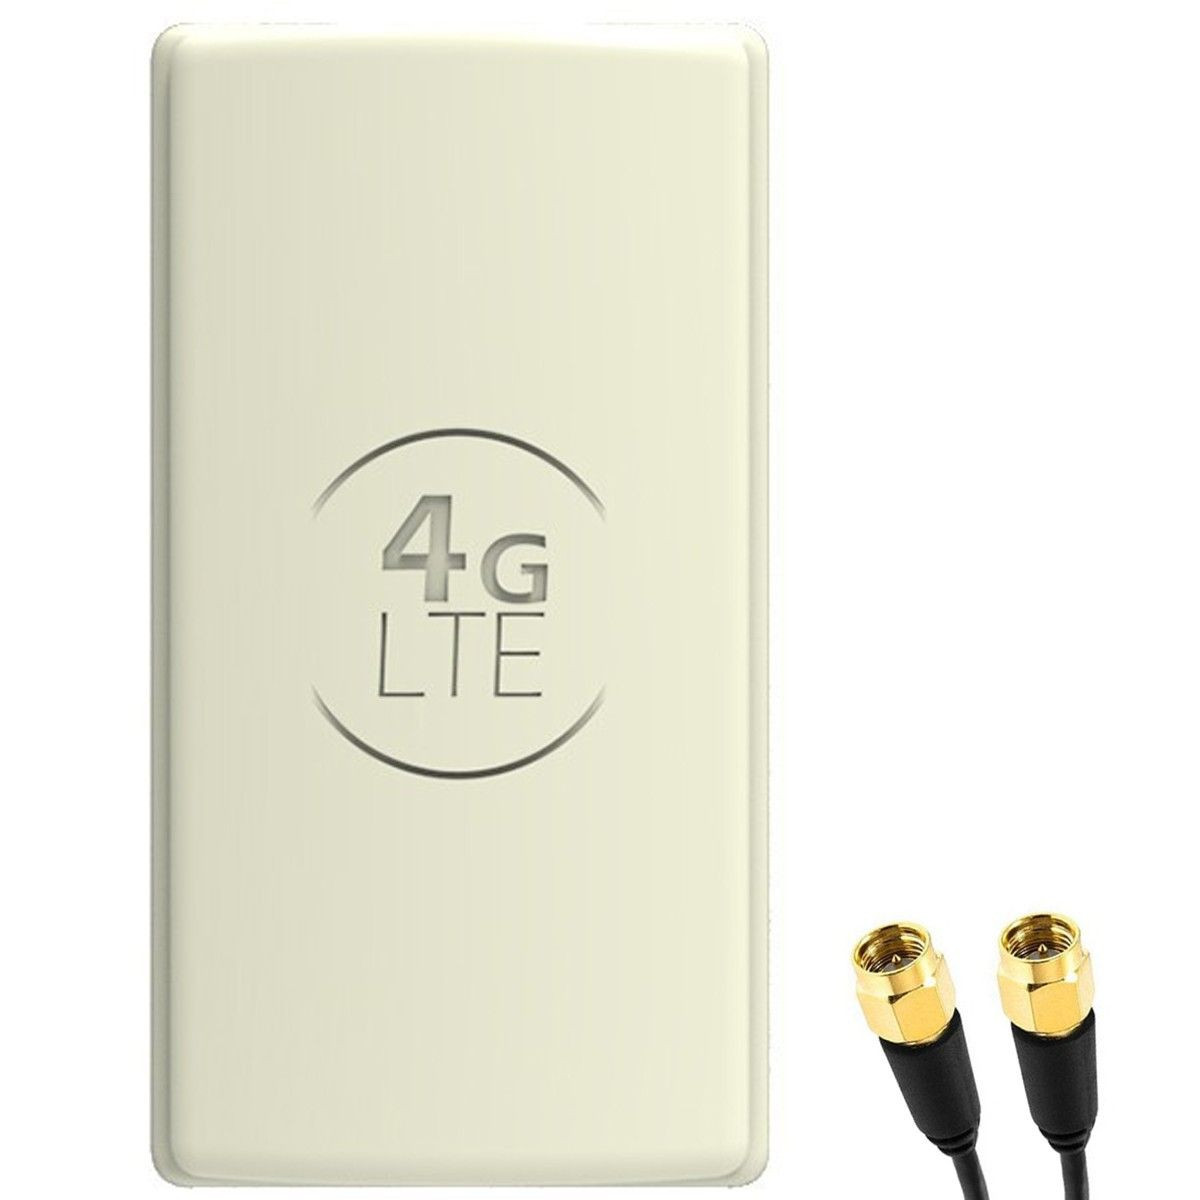 Antena 4G LTE DUAL PANEL 2x25 dBi + 2x10m BIAŁA + 2x SMA